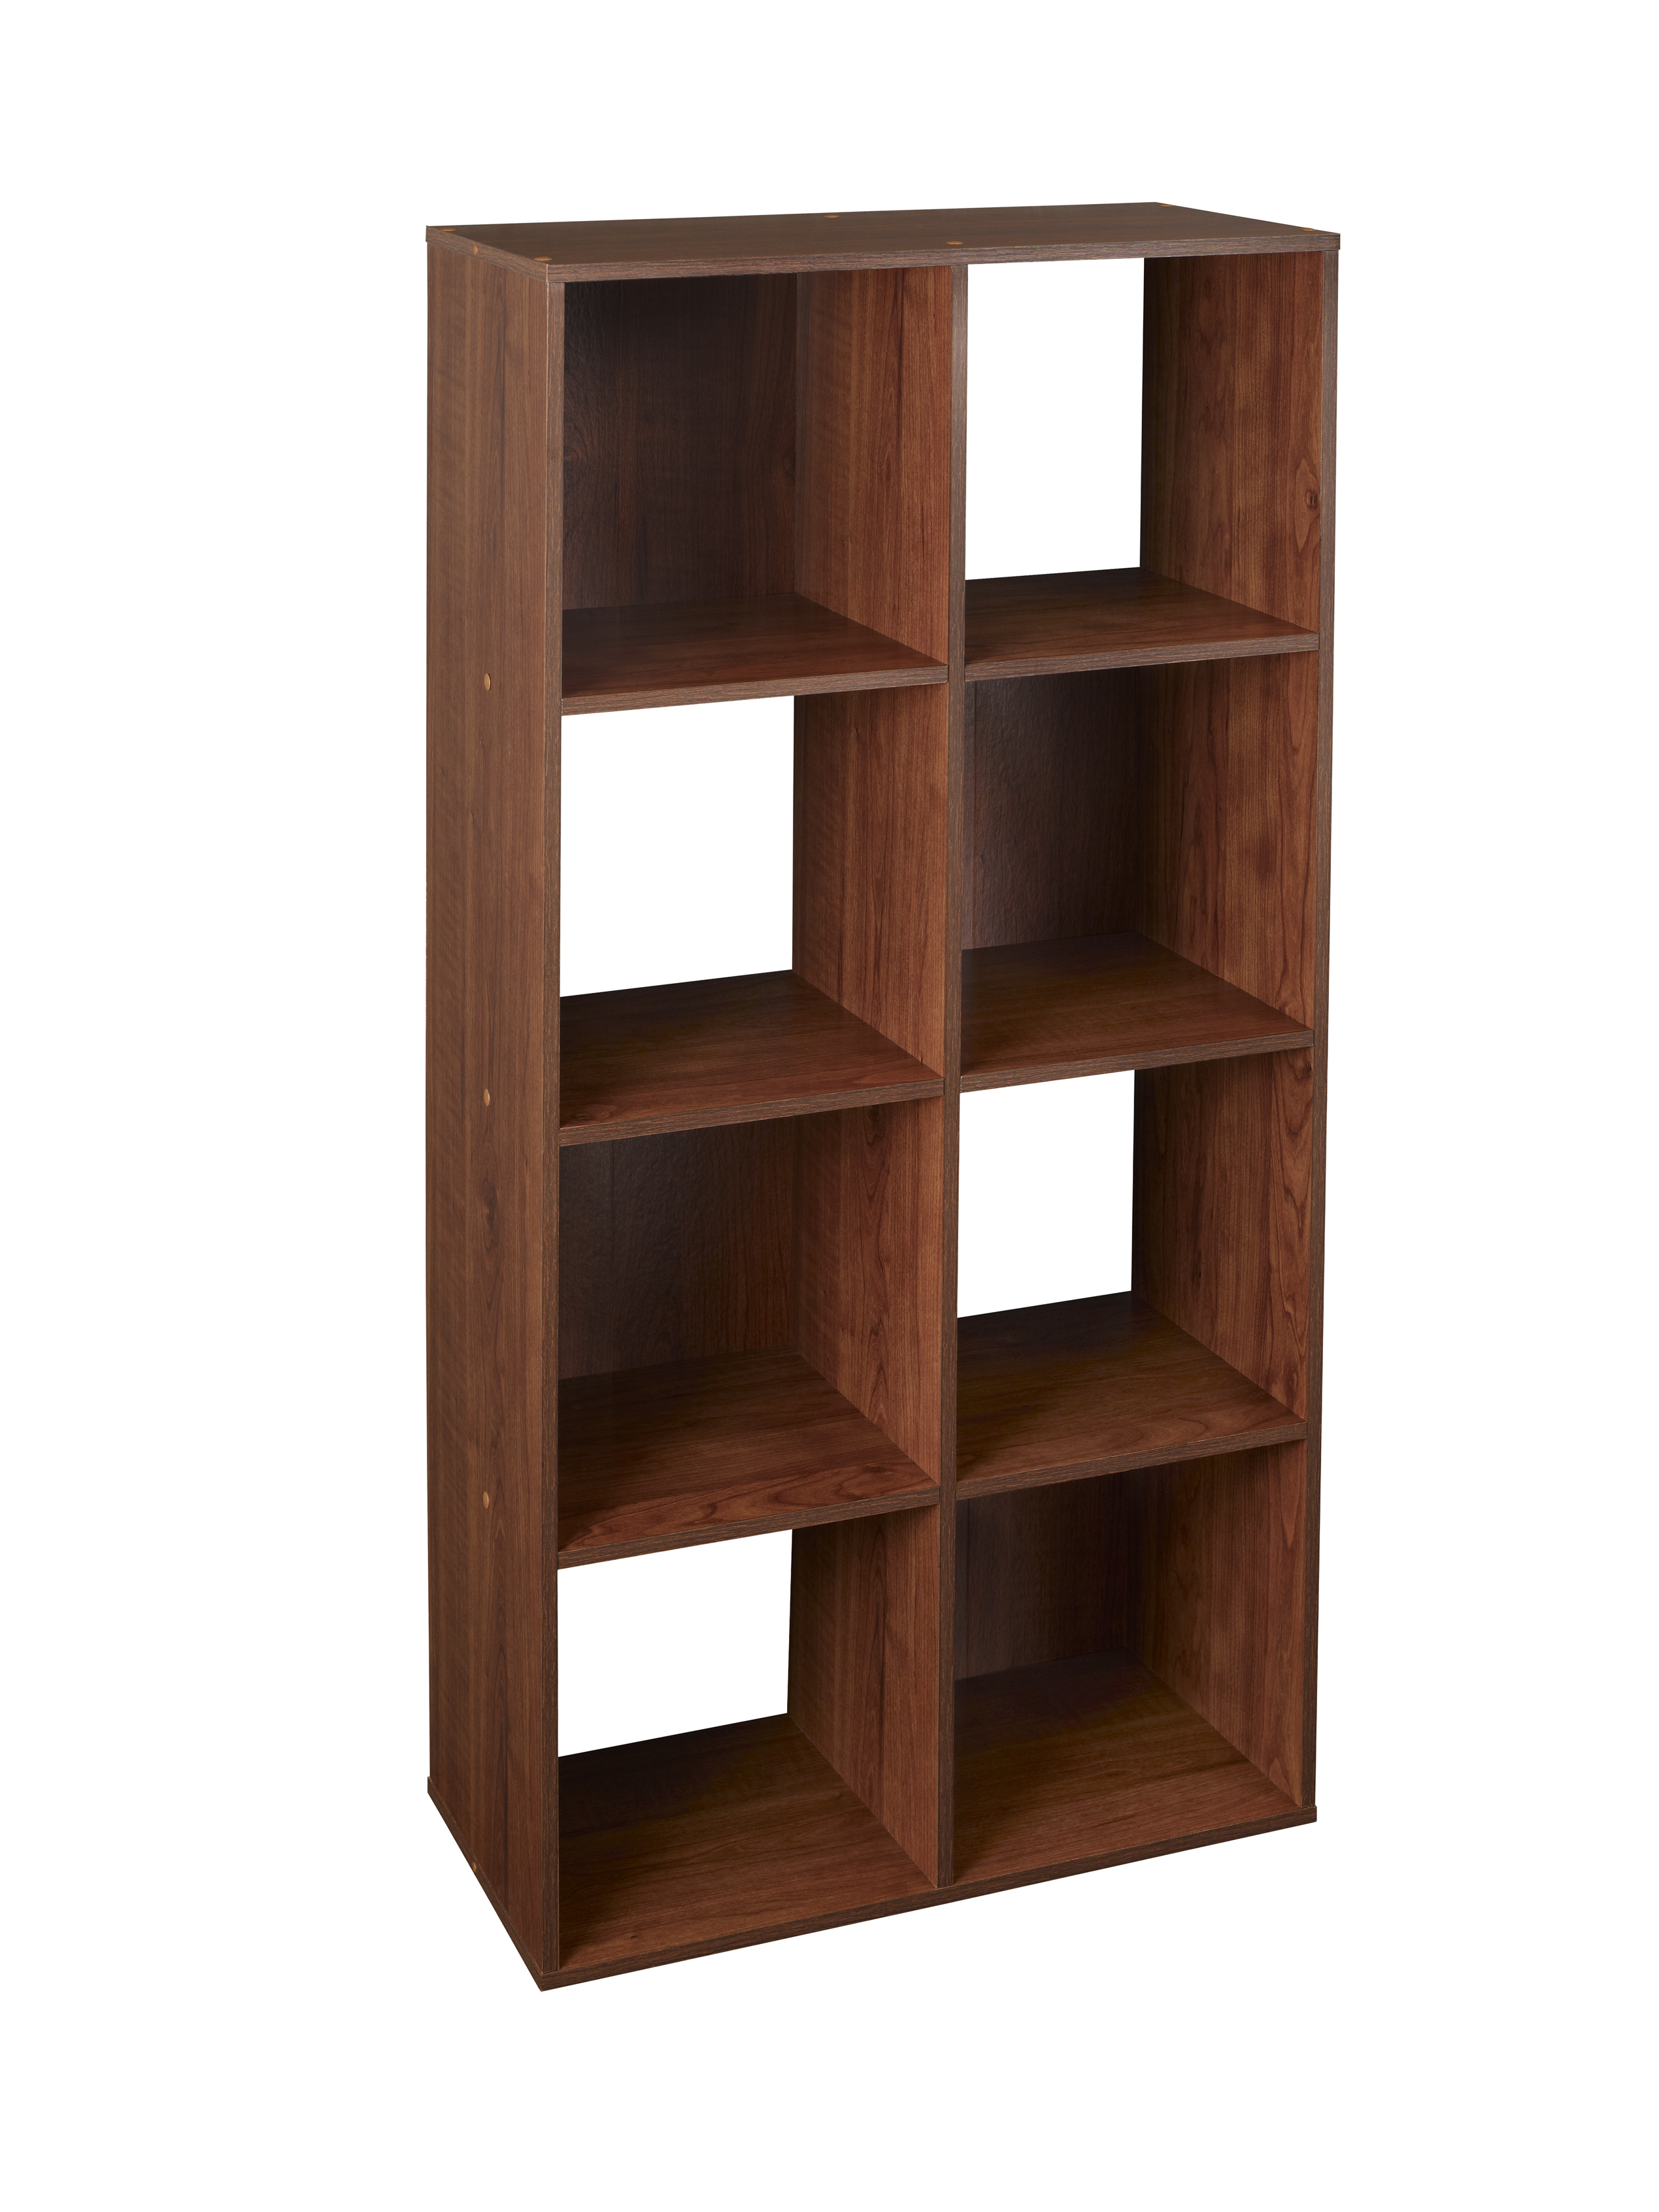 Closetmaid 420 Cubeicals 8 Cube Organizer White Ebay